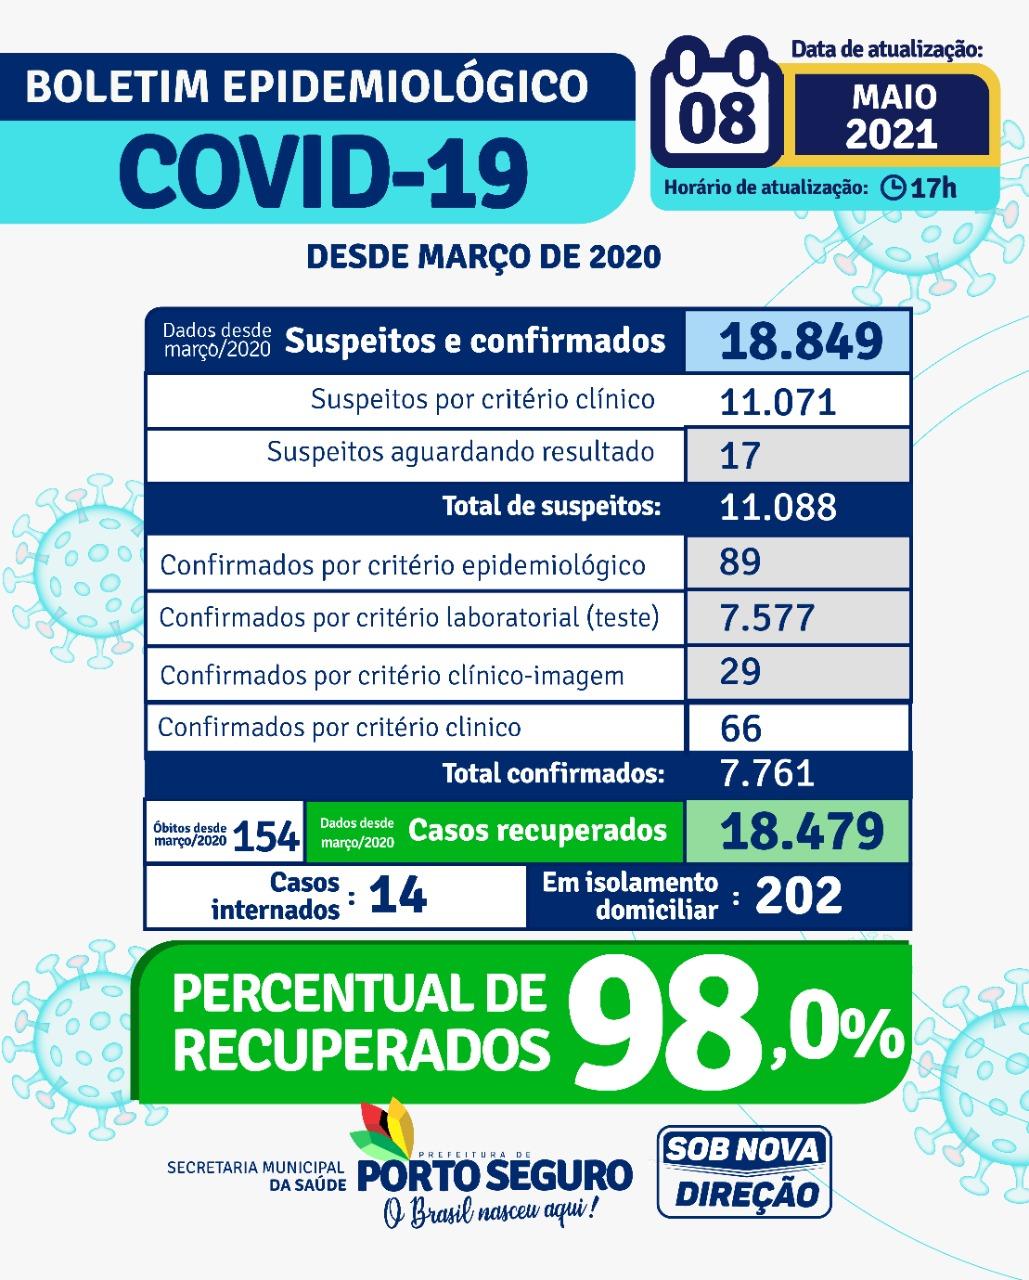 Porto Seguro: Boletim Epidemiológico Covid-19 (08/05/2021) 23